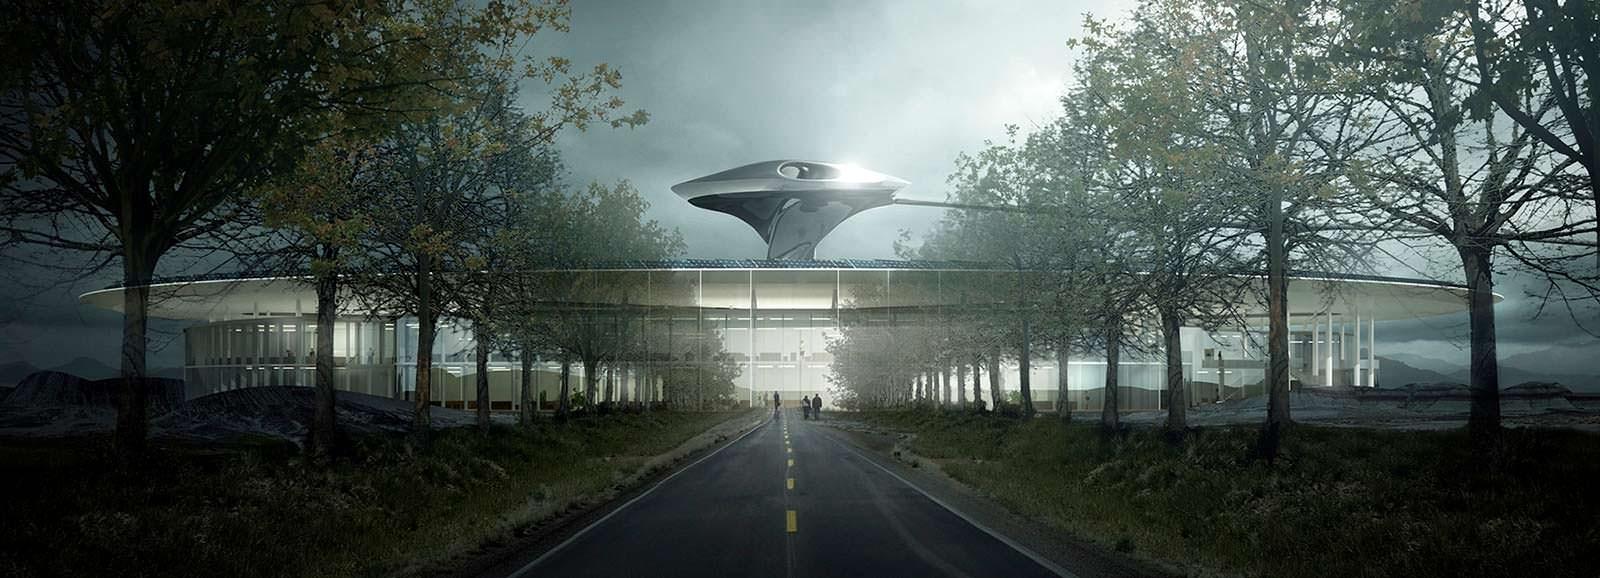 Штаб-квартира Faraday Future. Проект MAD Architecture